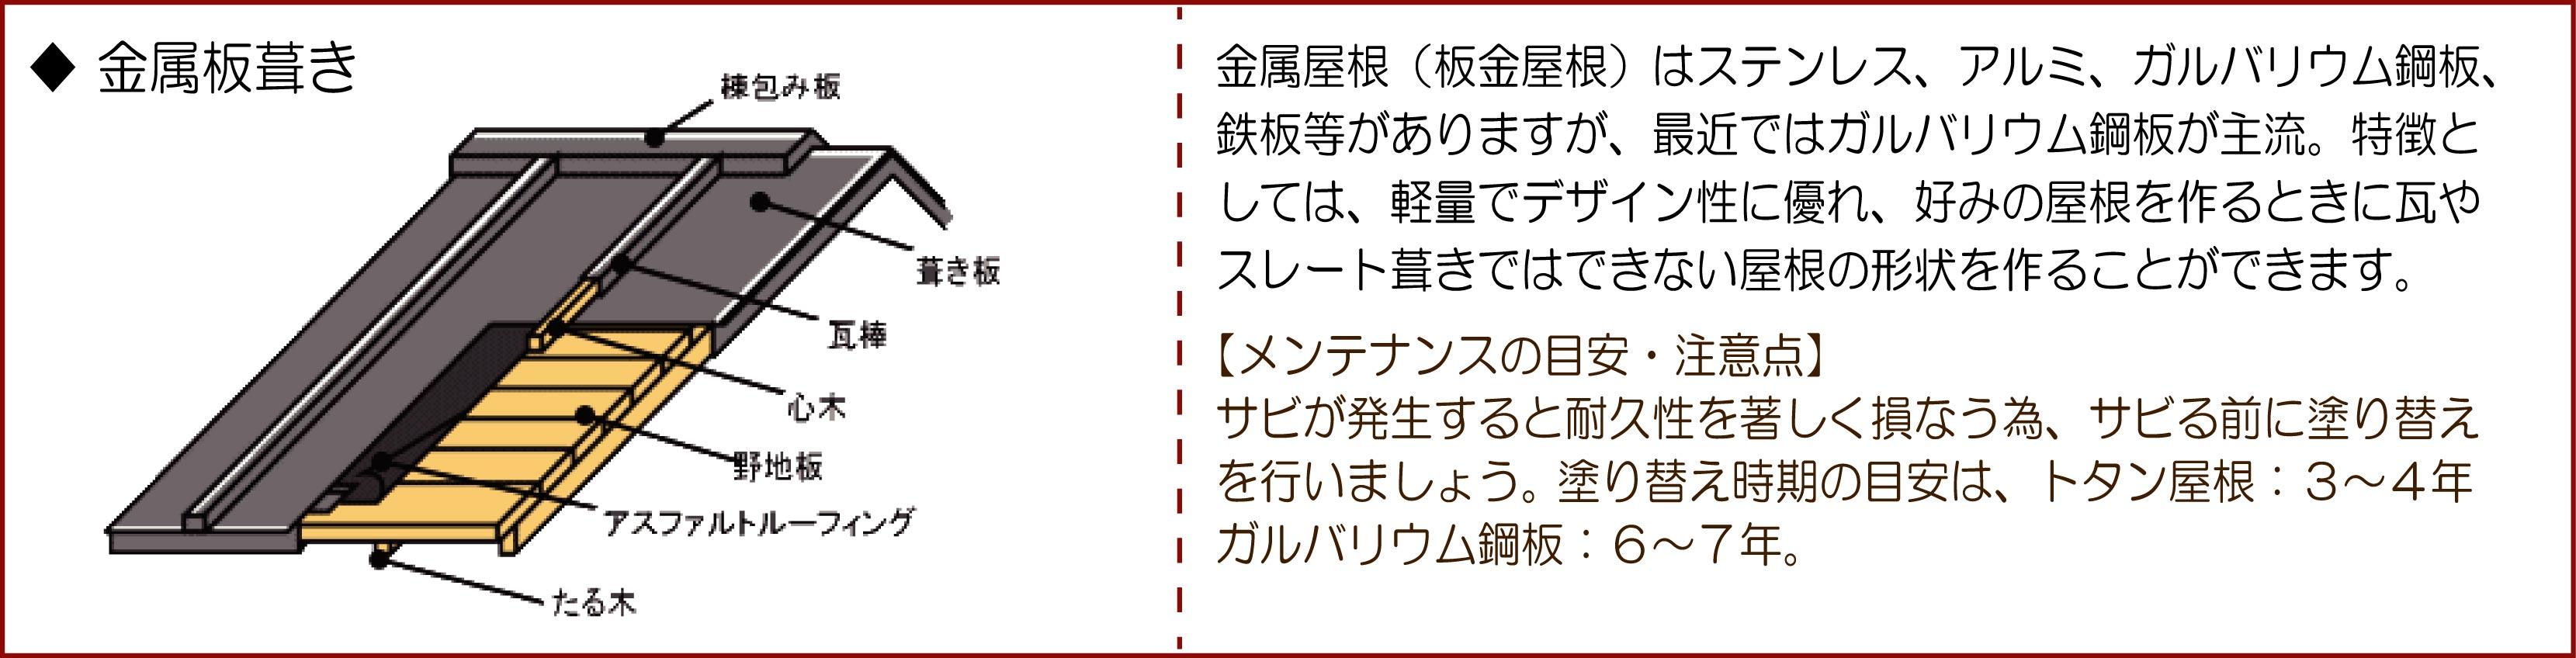 KuraSi-natu-sin80-11.jpg